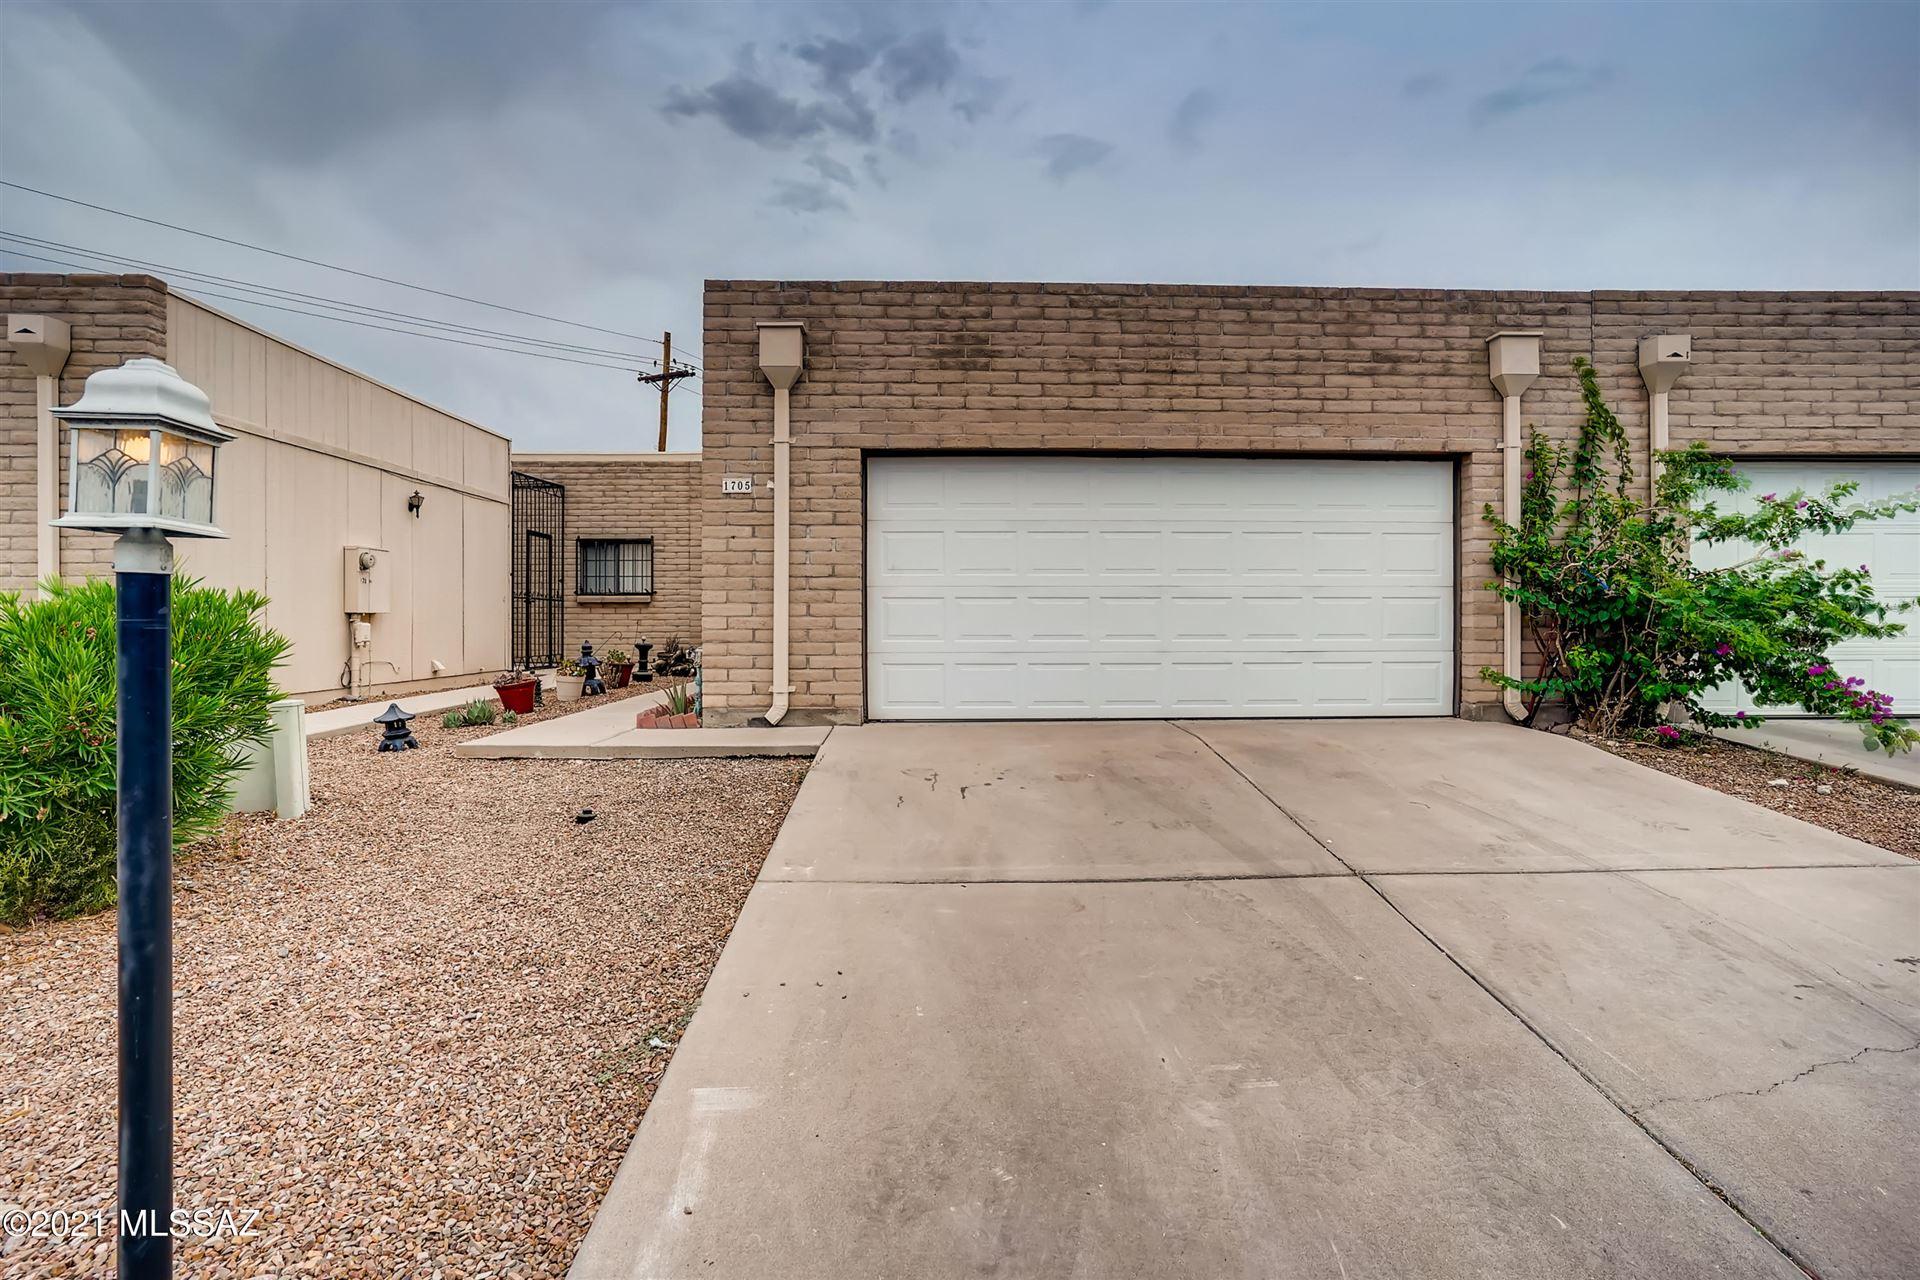 1705 S Thaxton Drive, Tucson, AZ 85710 - MLS#: 22116125